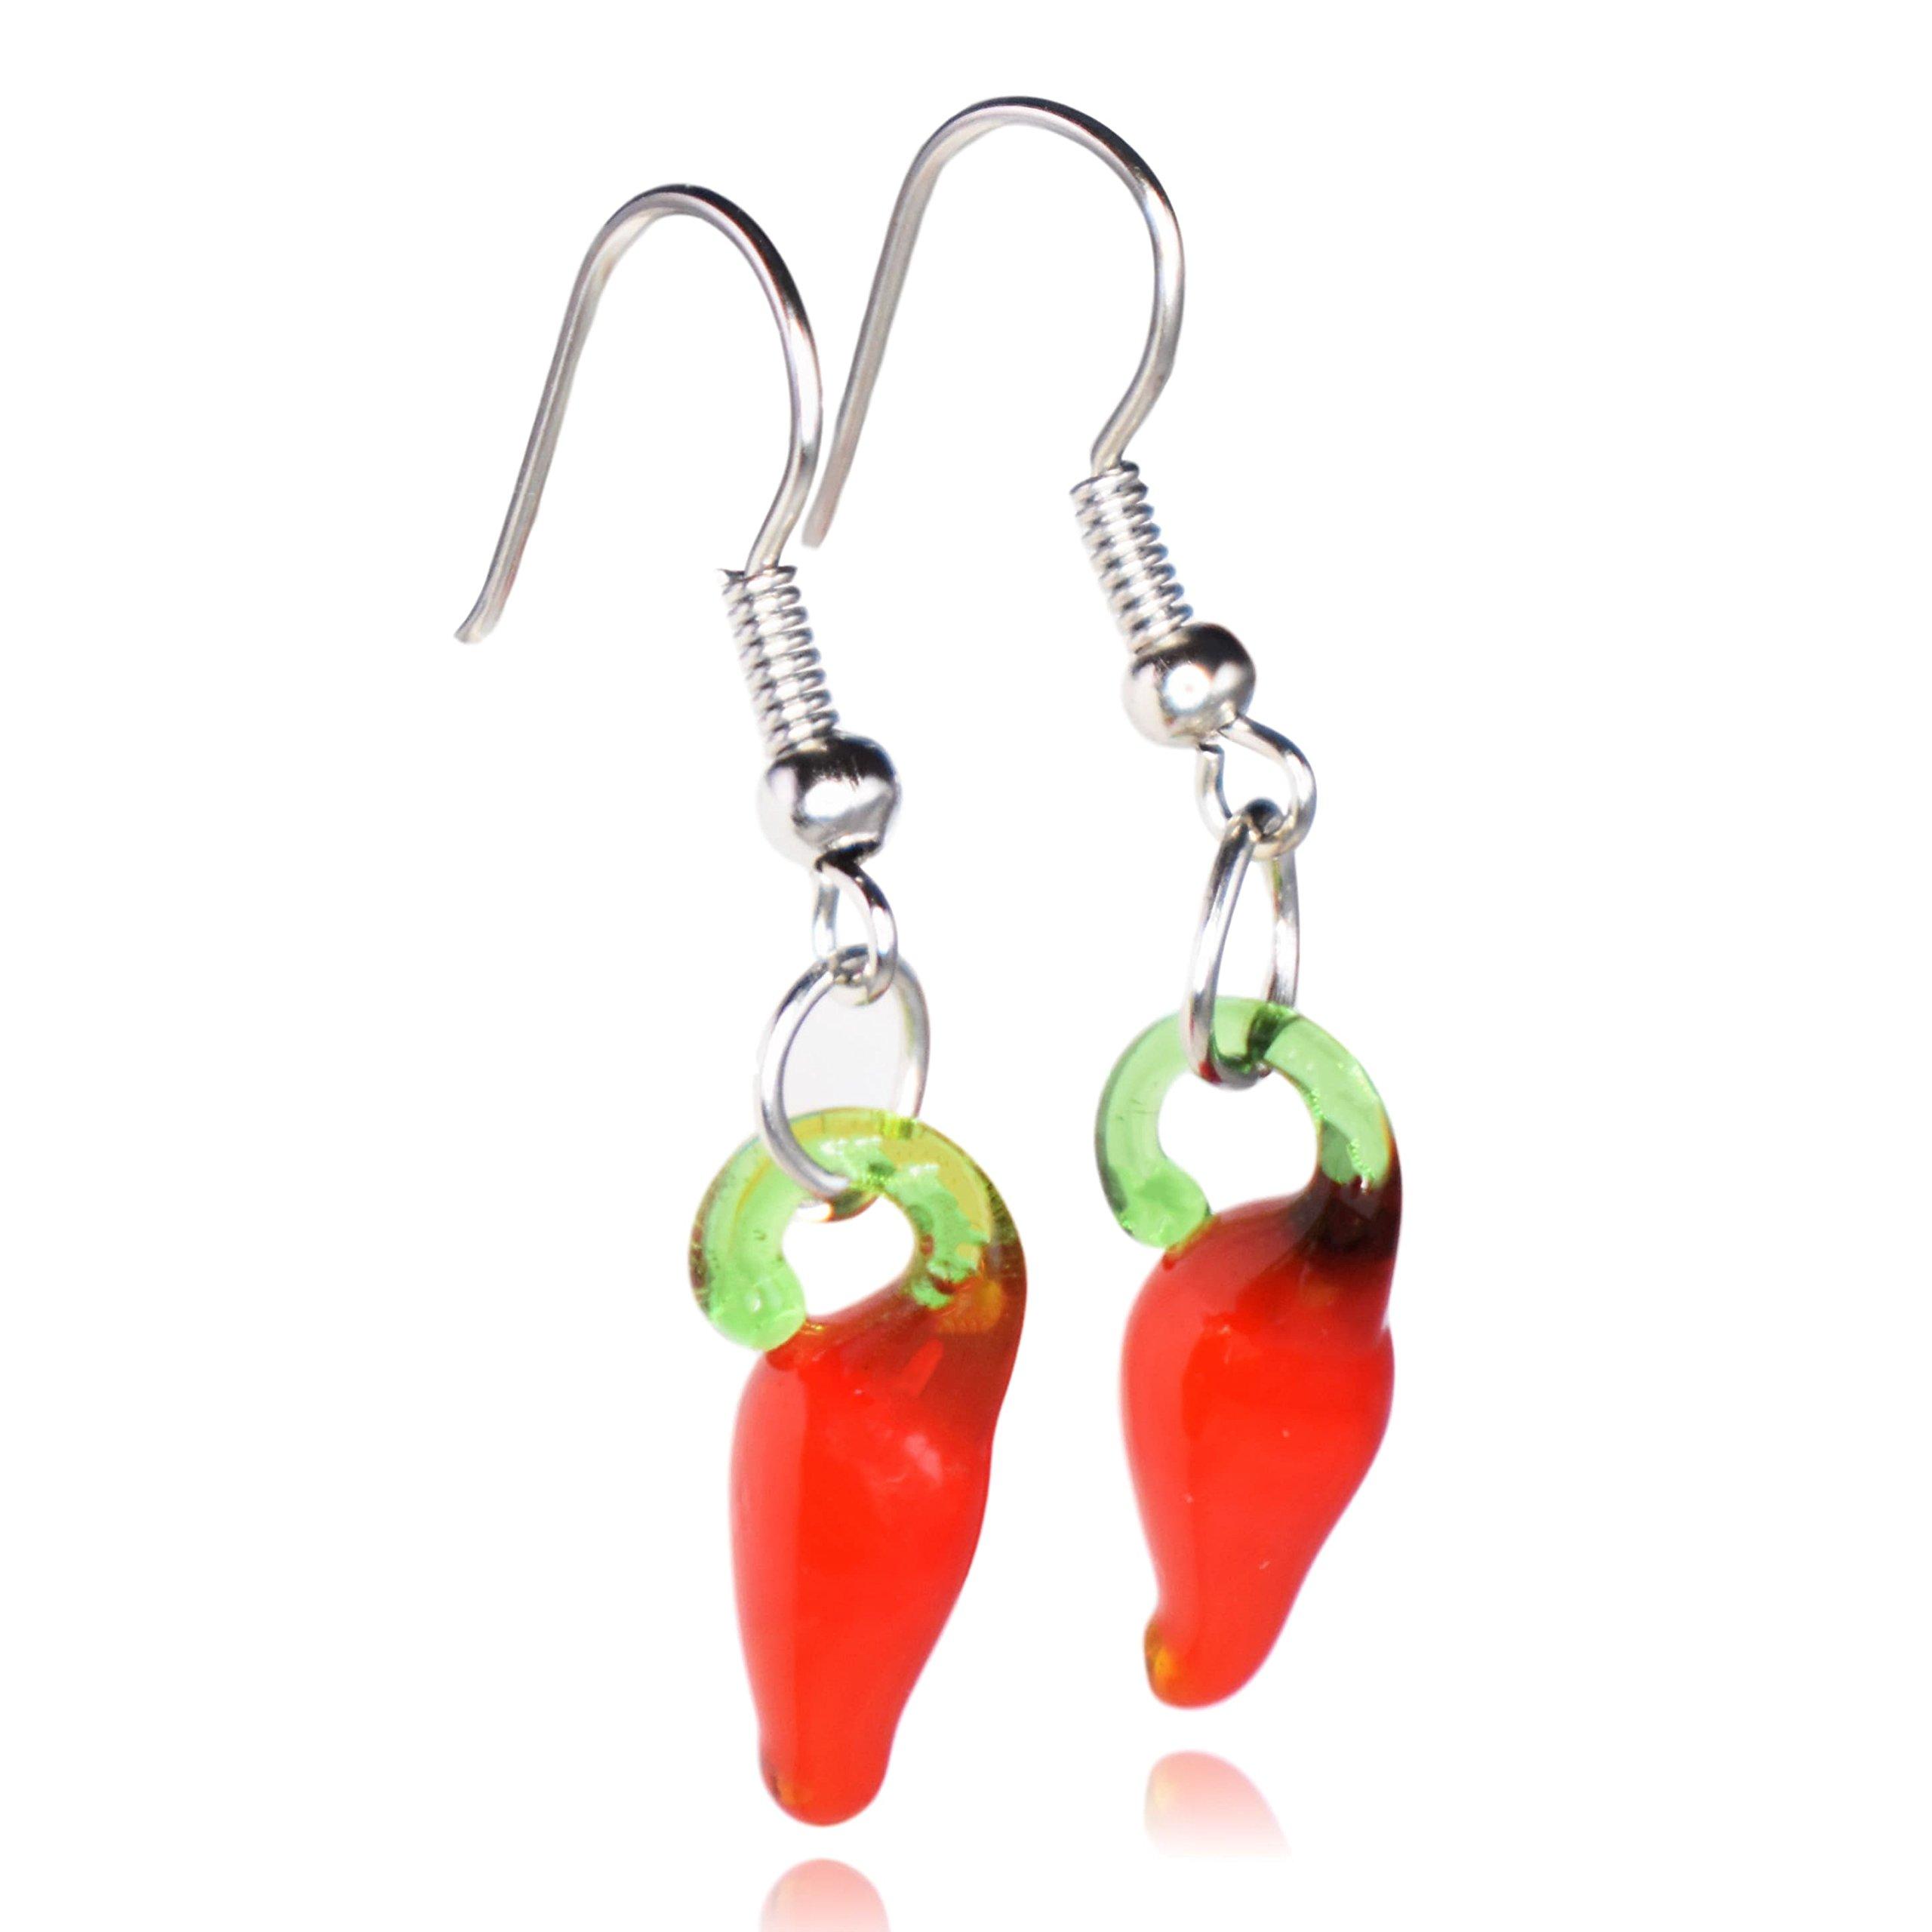 Glass Chili Pepper Dangle Earrings (Small)